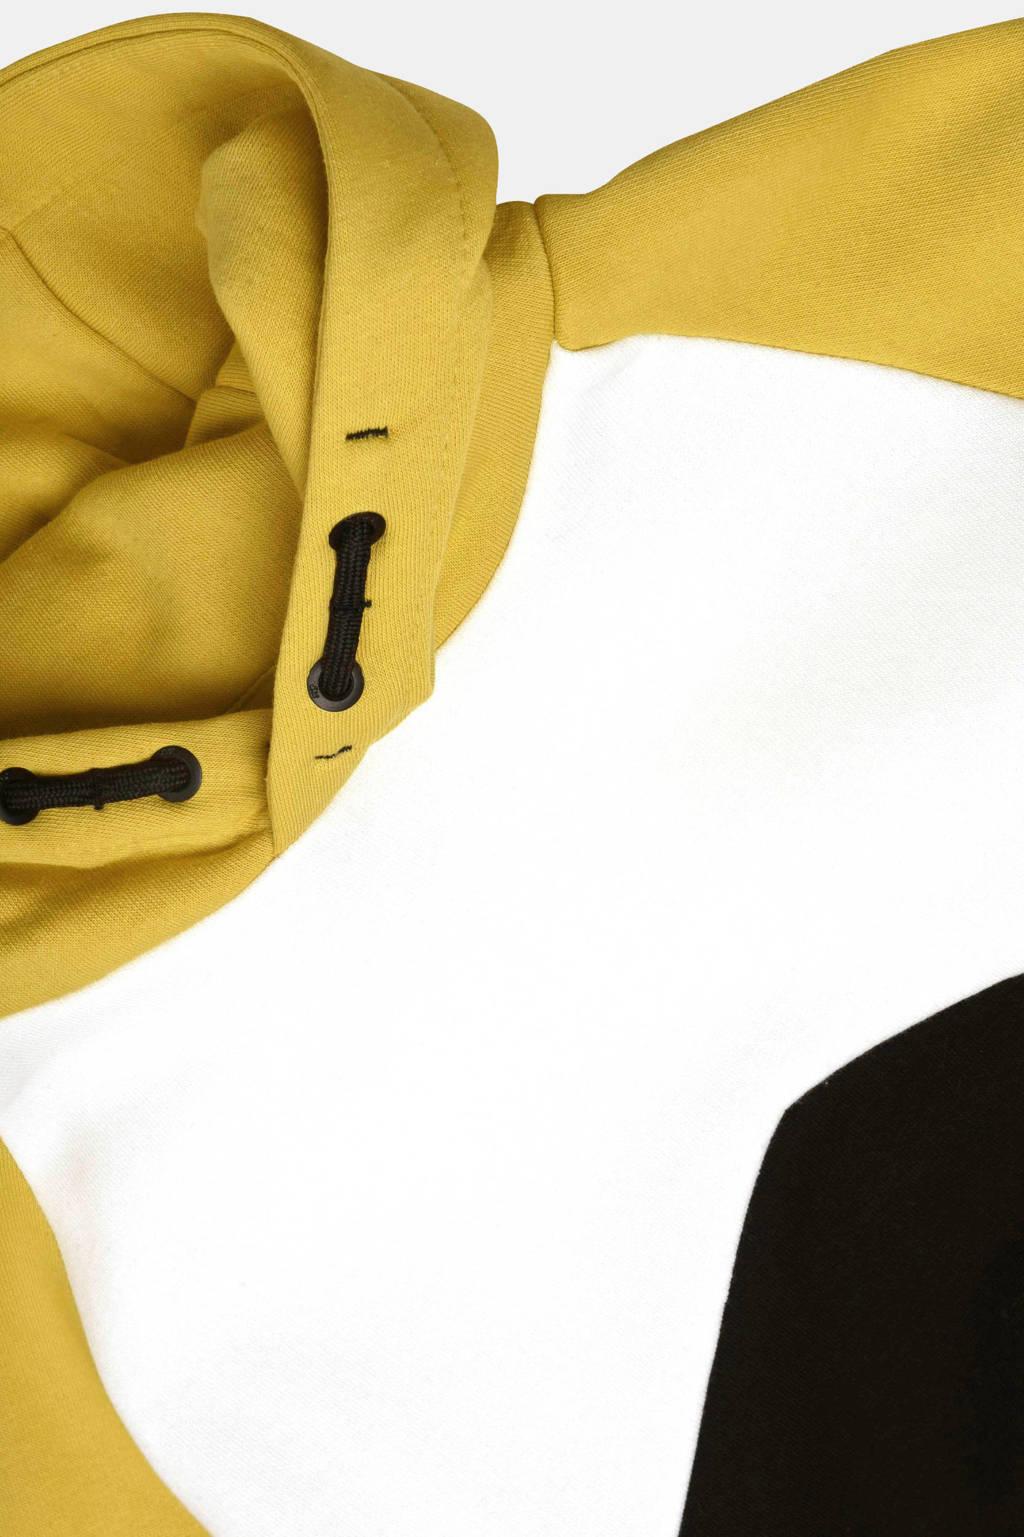 Jill & Mitch by Shoeby hoodie Alexander mosterdgeel/zwart/wit, Mosterdgeel/zwart/wit